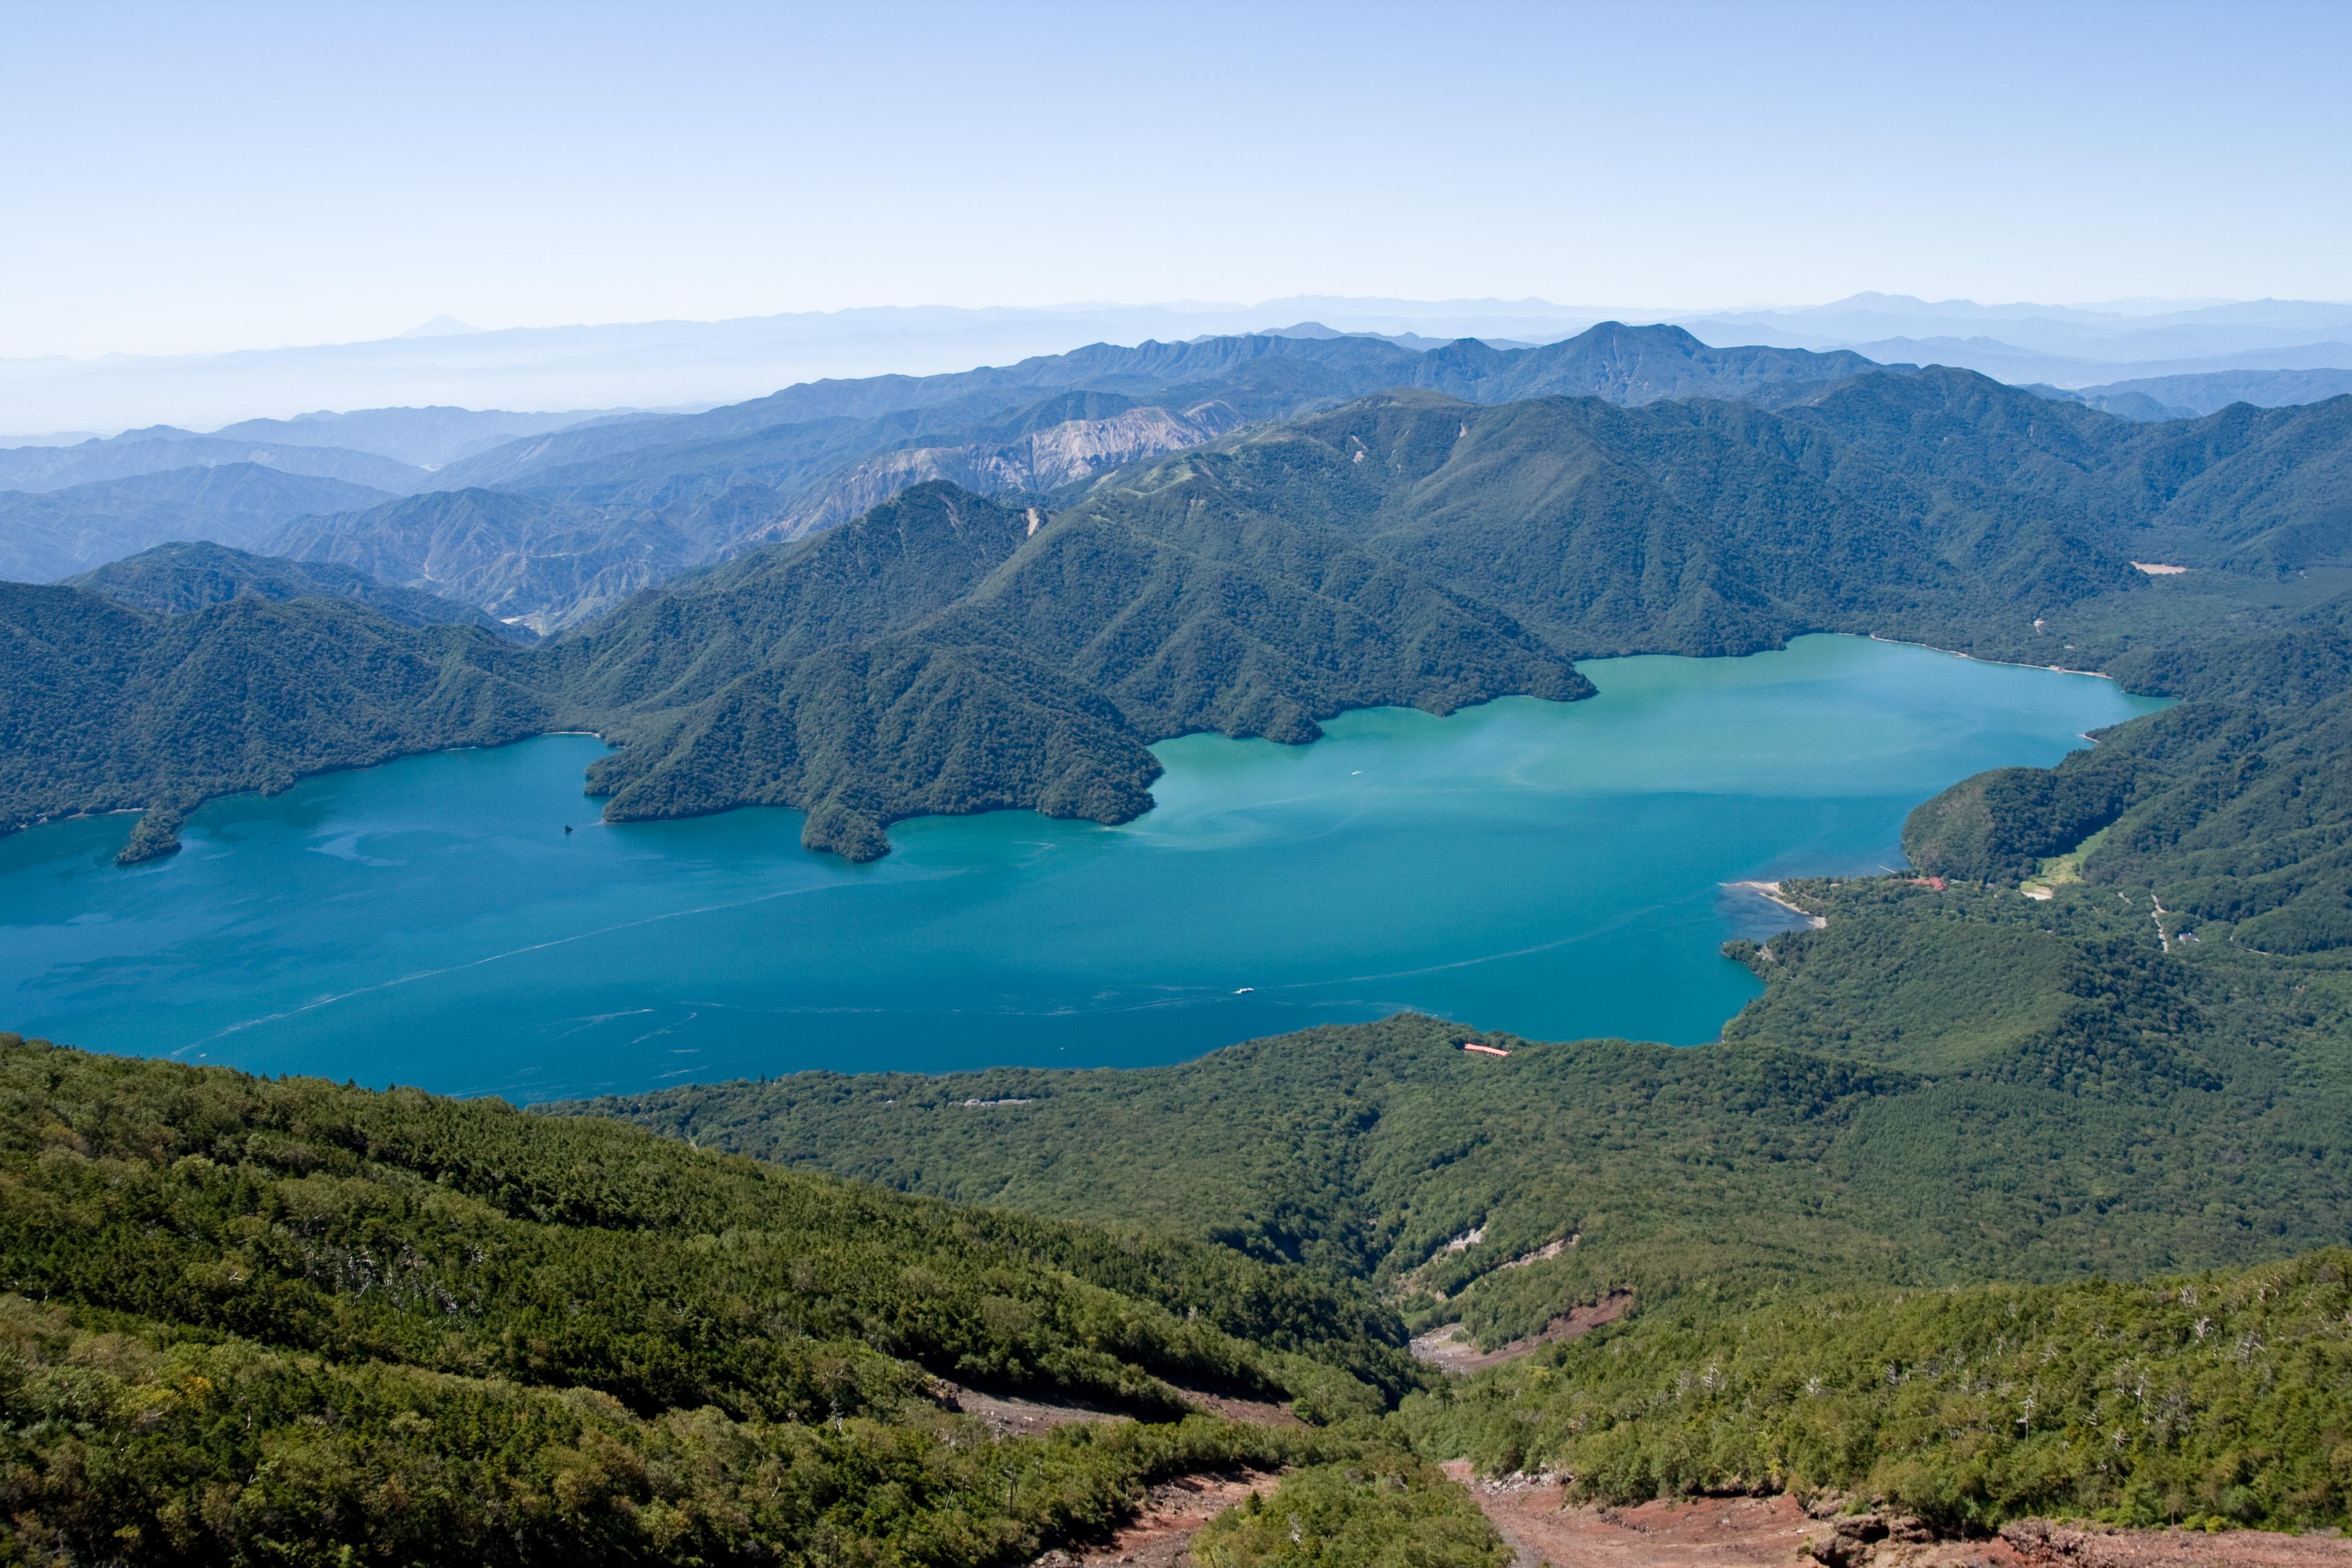 https://upload.wikimedia.org/wikipedia/commons/c/ca/Lake_Chuzenji_14.jpg